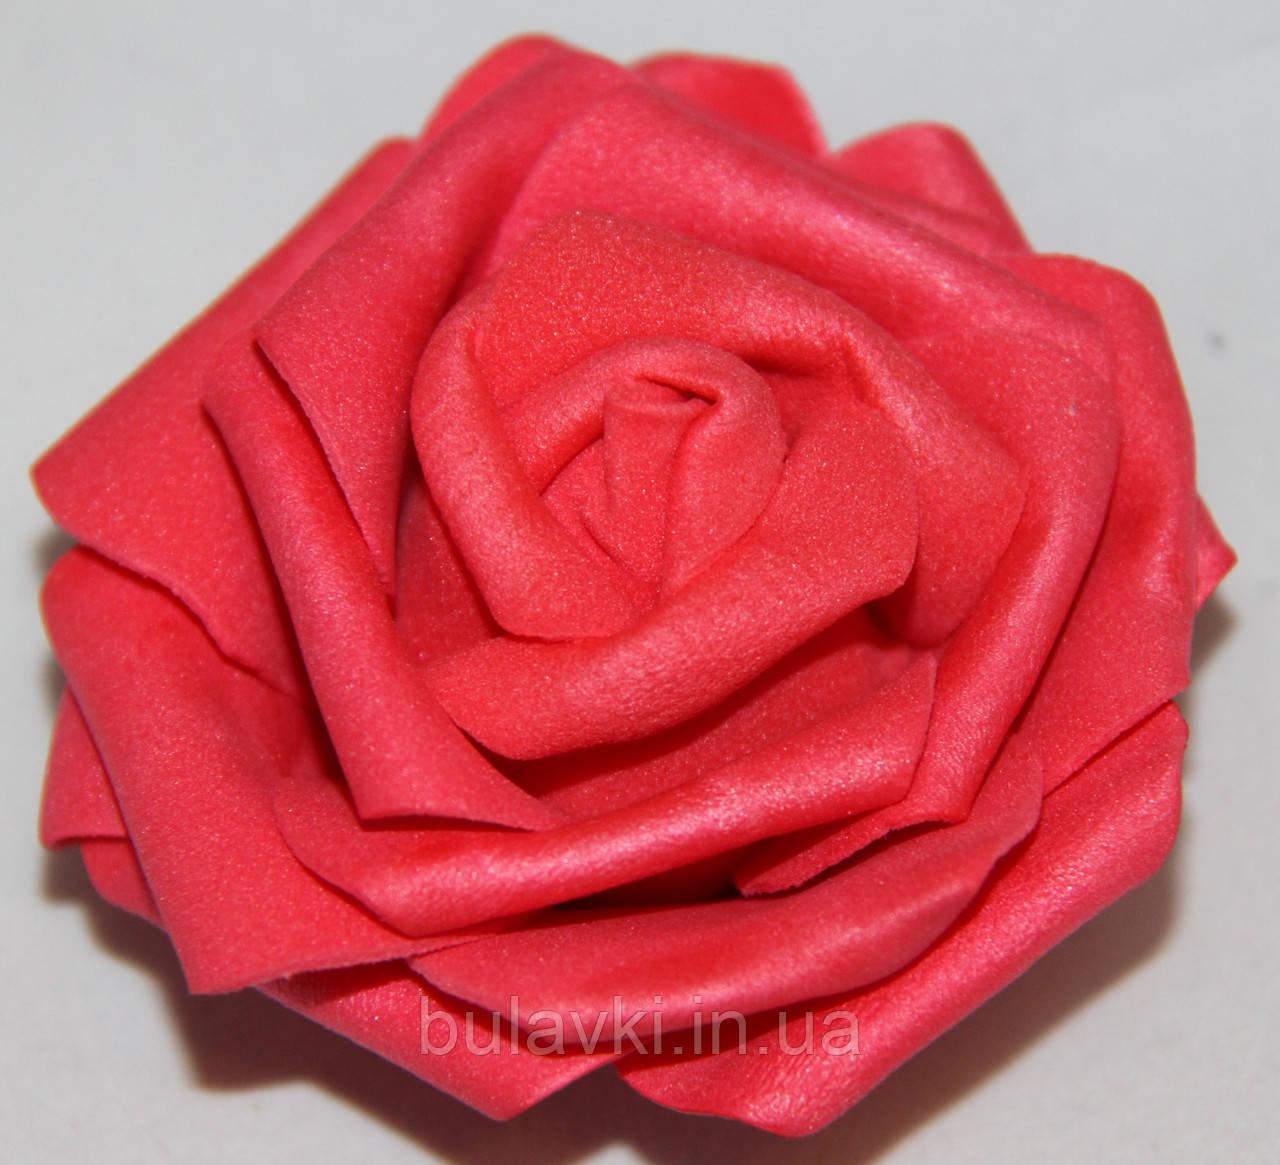 Роза красная   2017-1-17-1 (средняя)